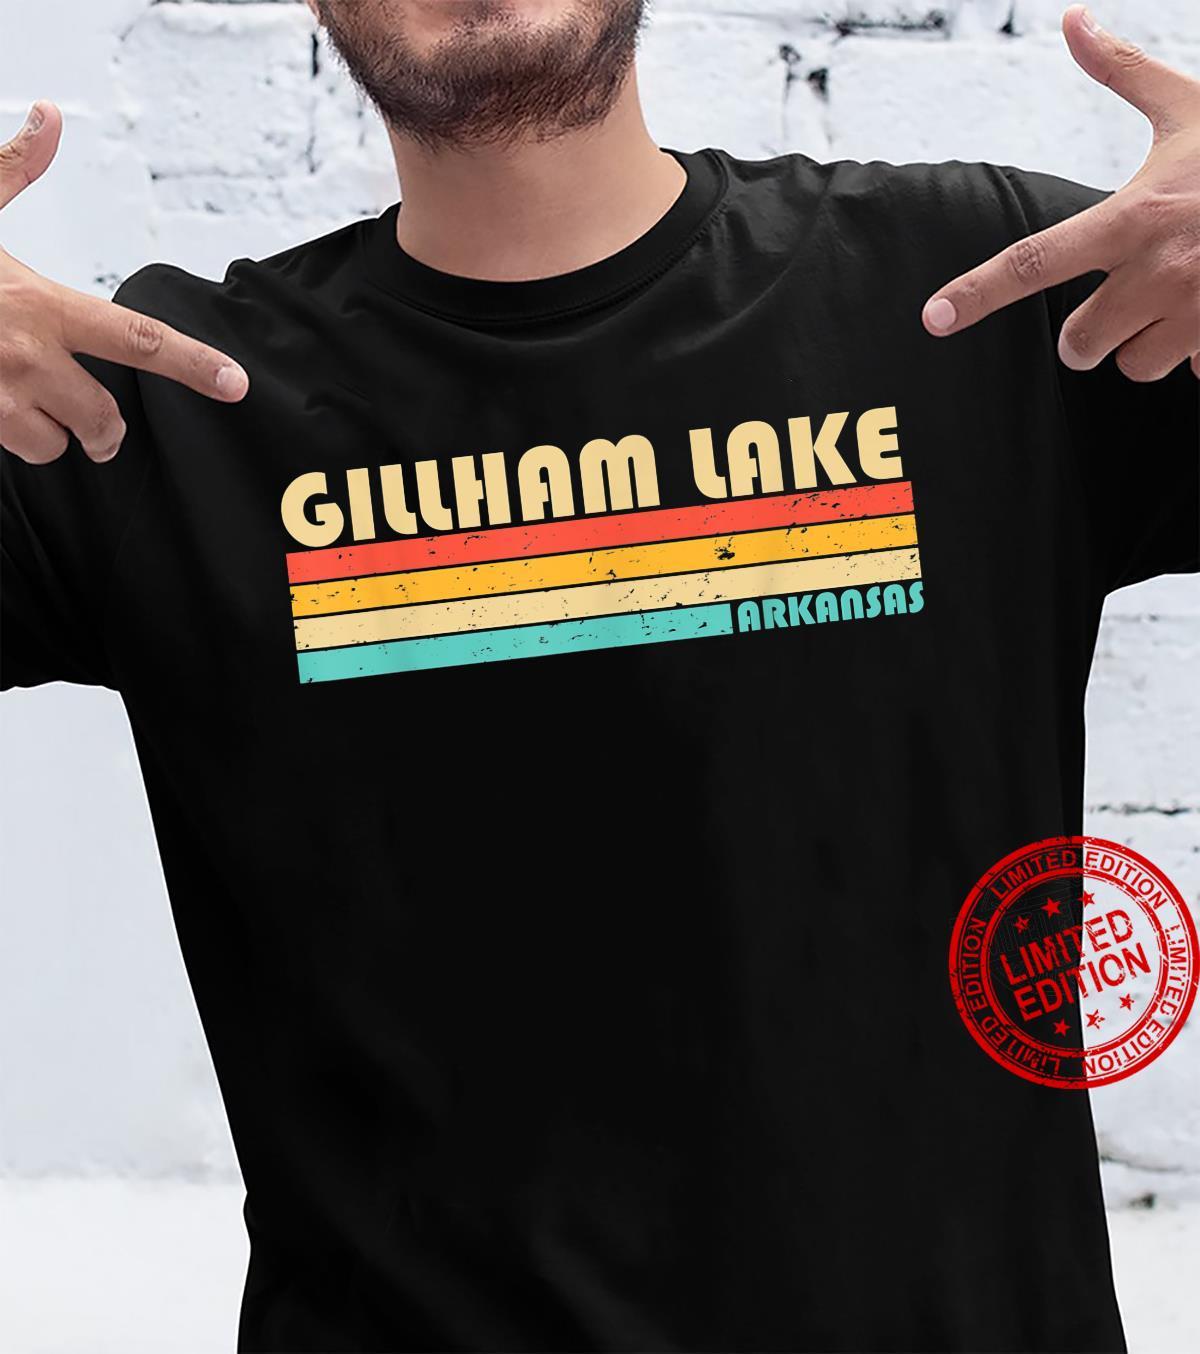 GILLHAM LAKE ARKANSAS Fishing Camping Summer Shirt